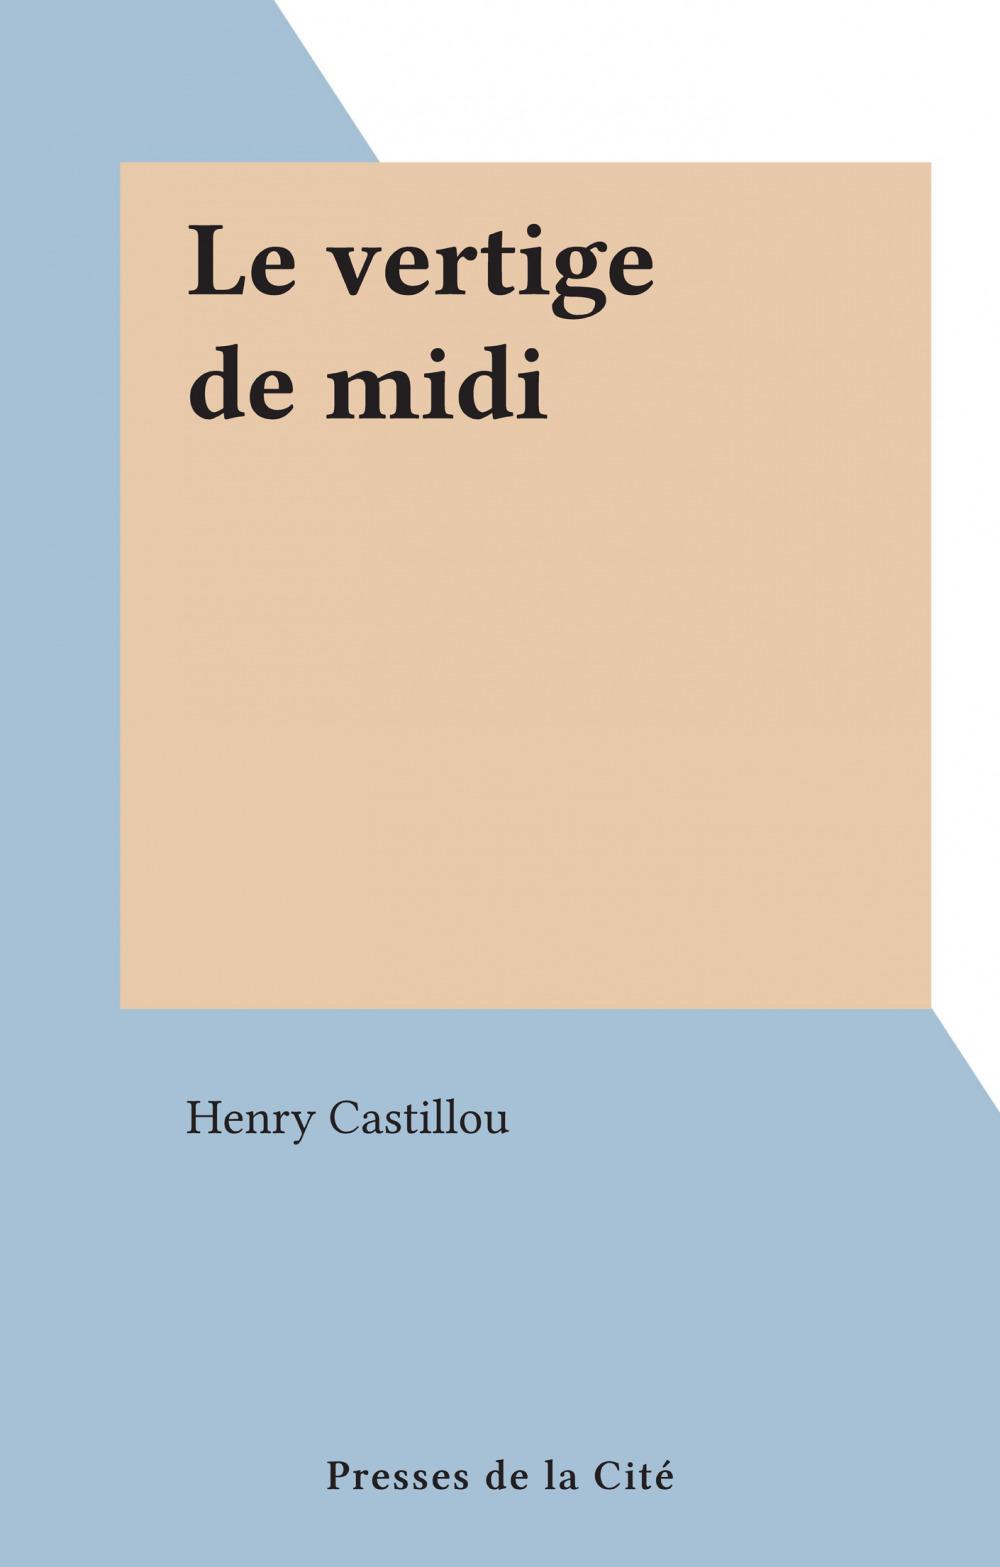 Le vertige de midi  - Henry Castillou